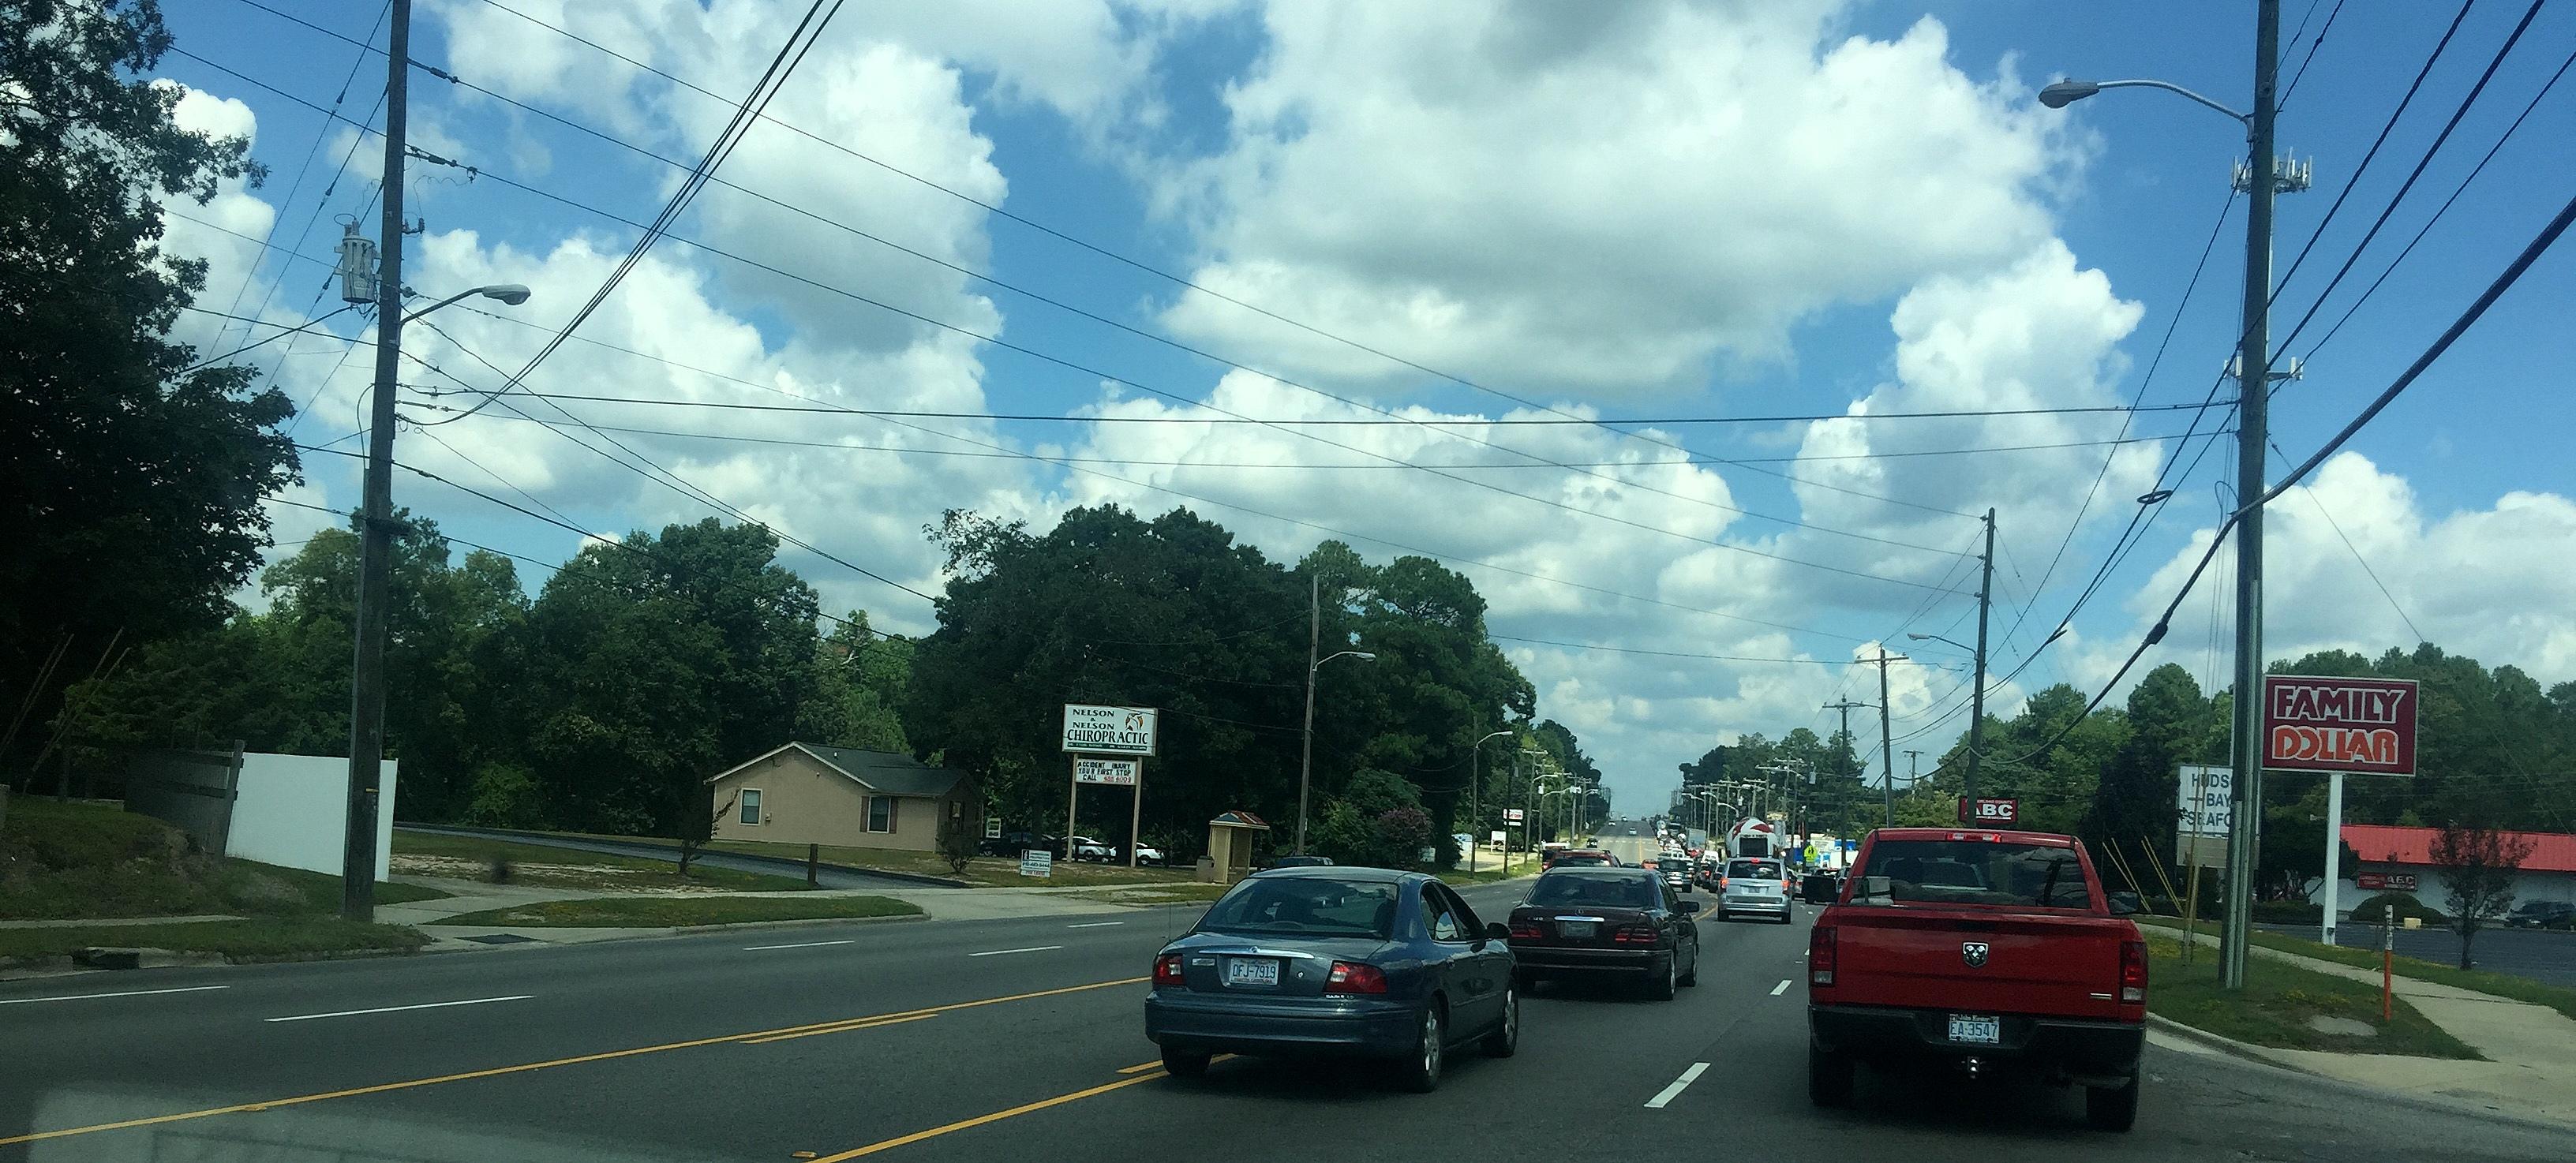 Impediments ~ Traffic enroute to my auto repair shop, 09/01